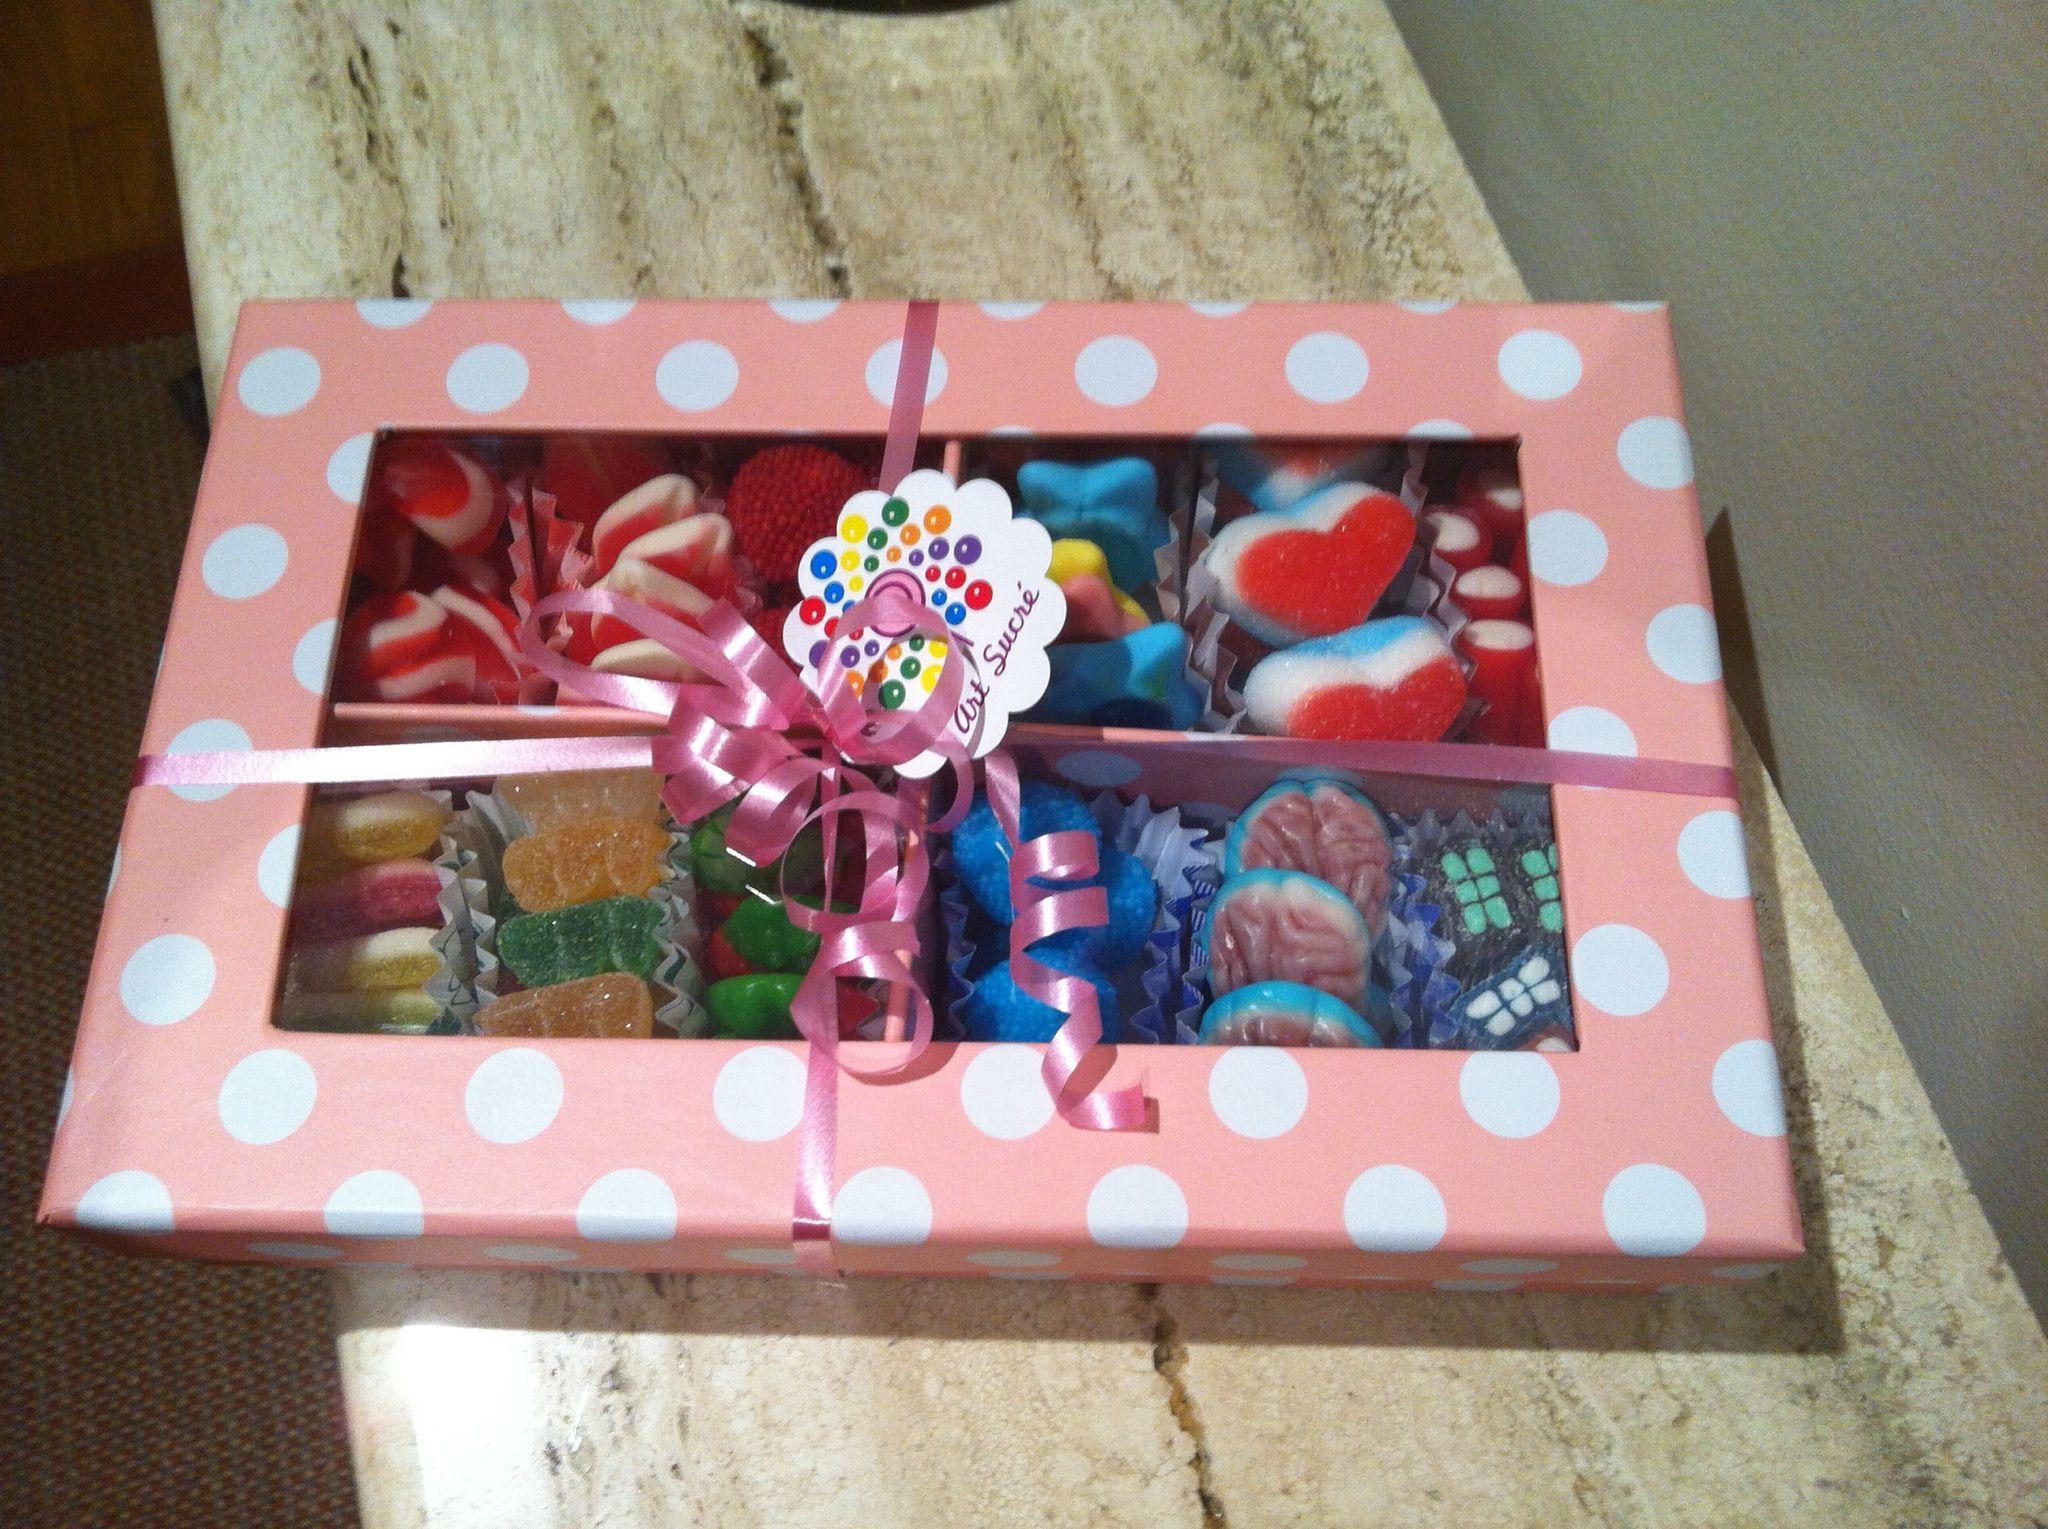 Caja Dulce Regalos De Caramelos Cajitas Para Dulces Regalos Creativos